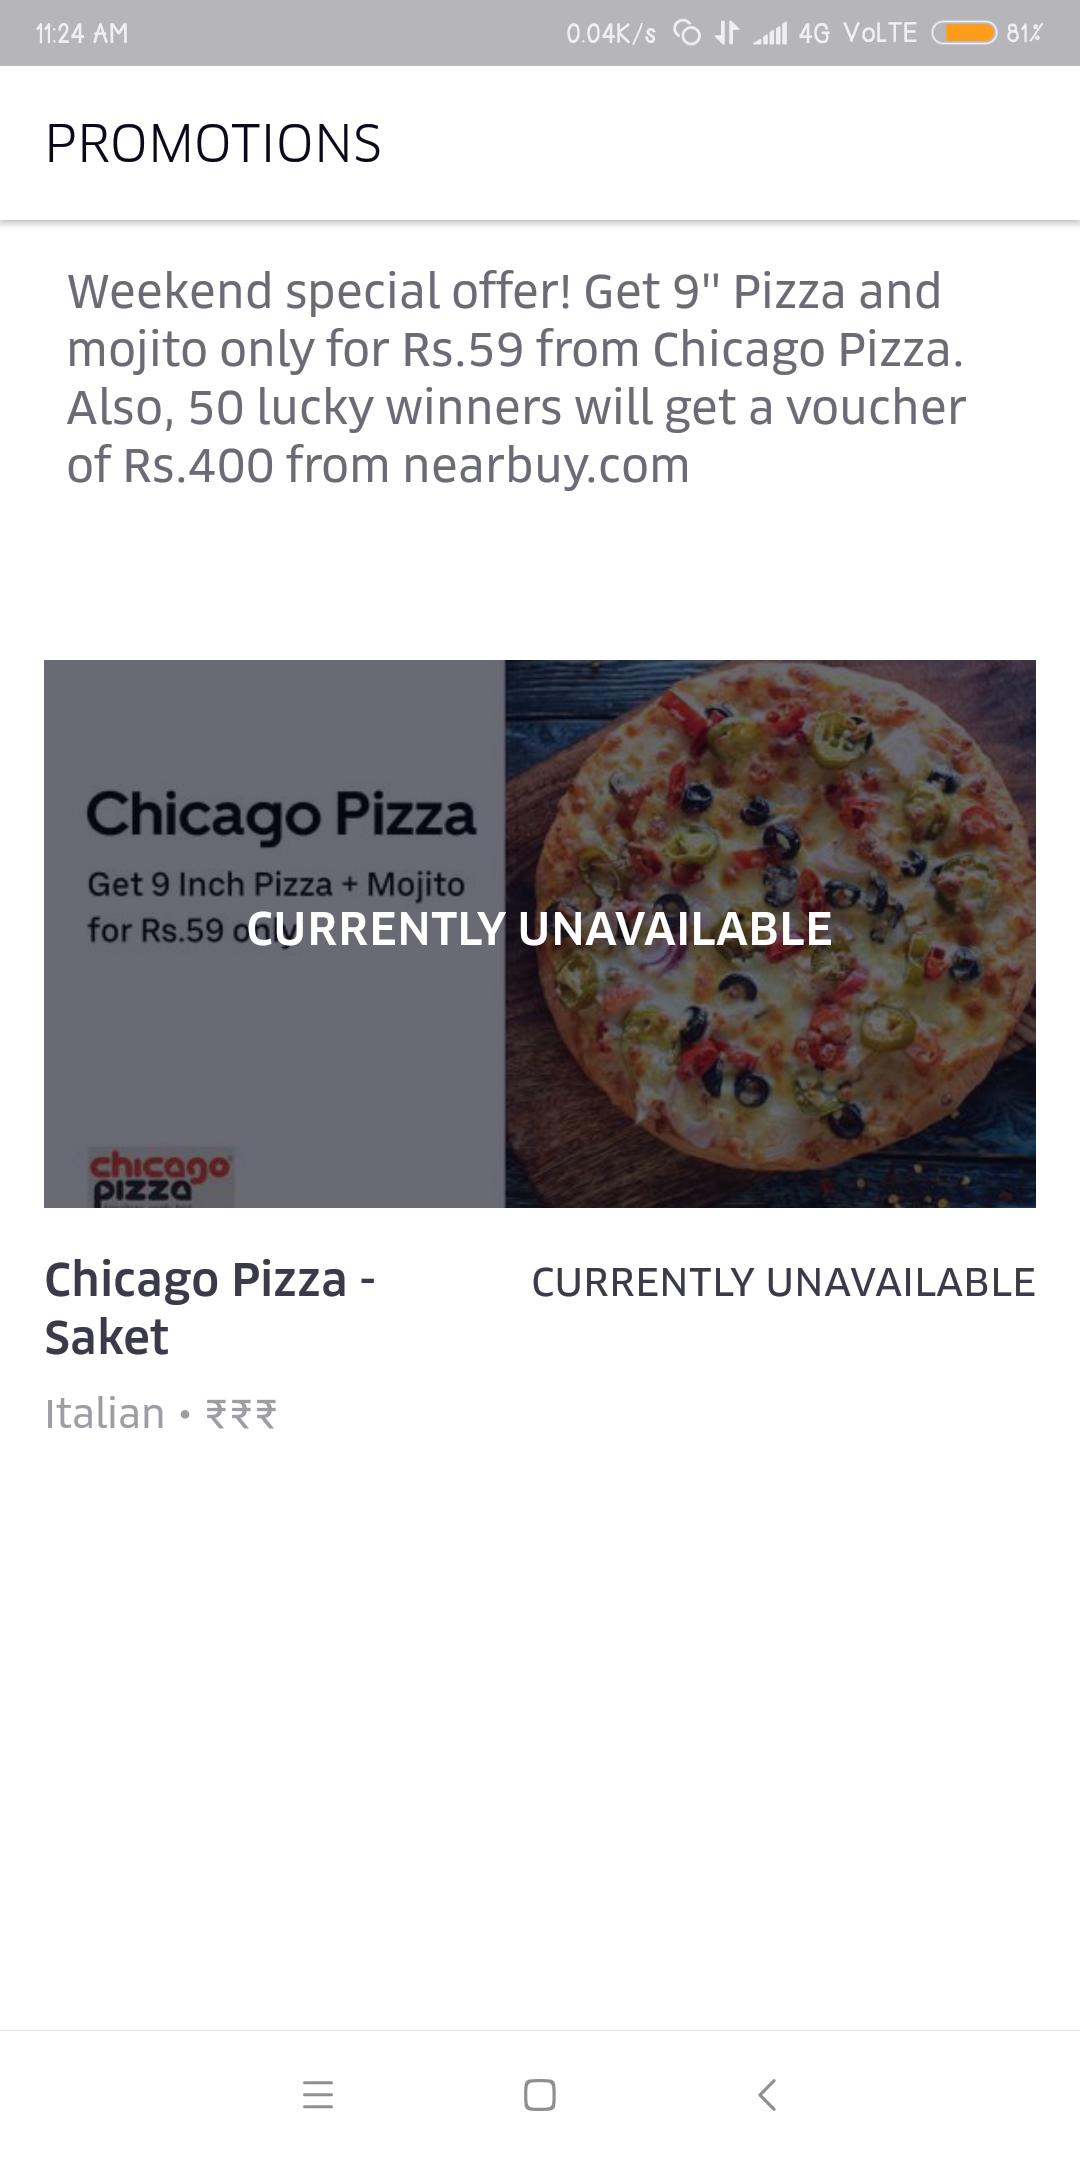 https://cdn0.desidime.com/attachments/photos/555846/original/Screenshot_2019-03-08-11-24-41-924_com.ubercab.eats.png?1552024585